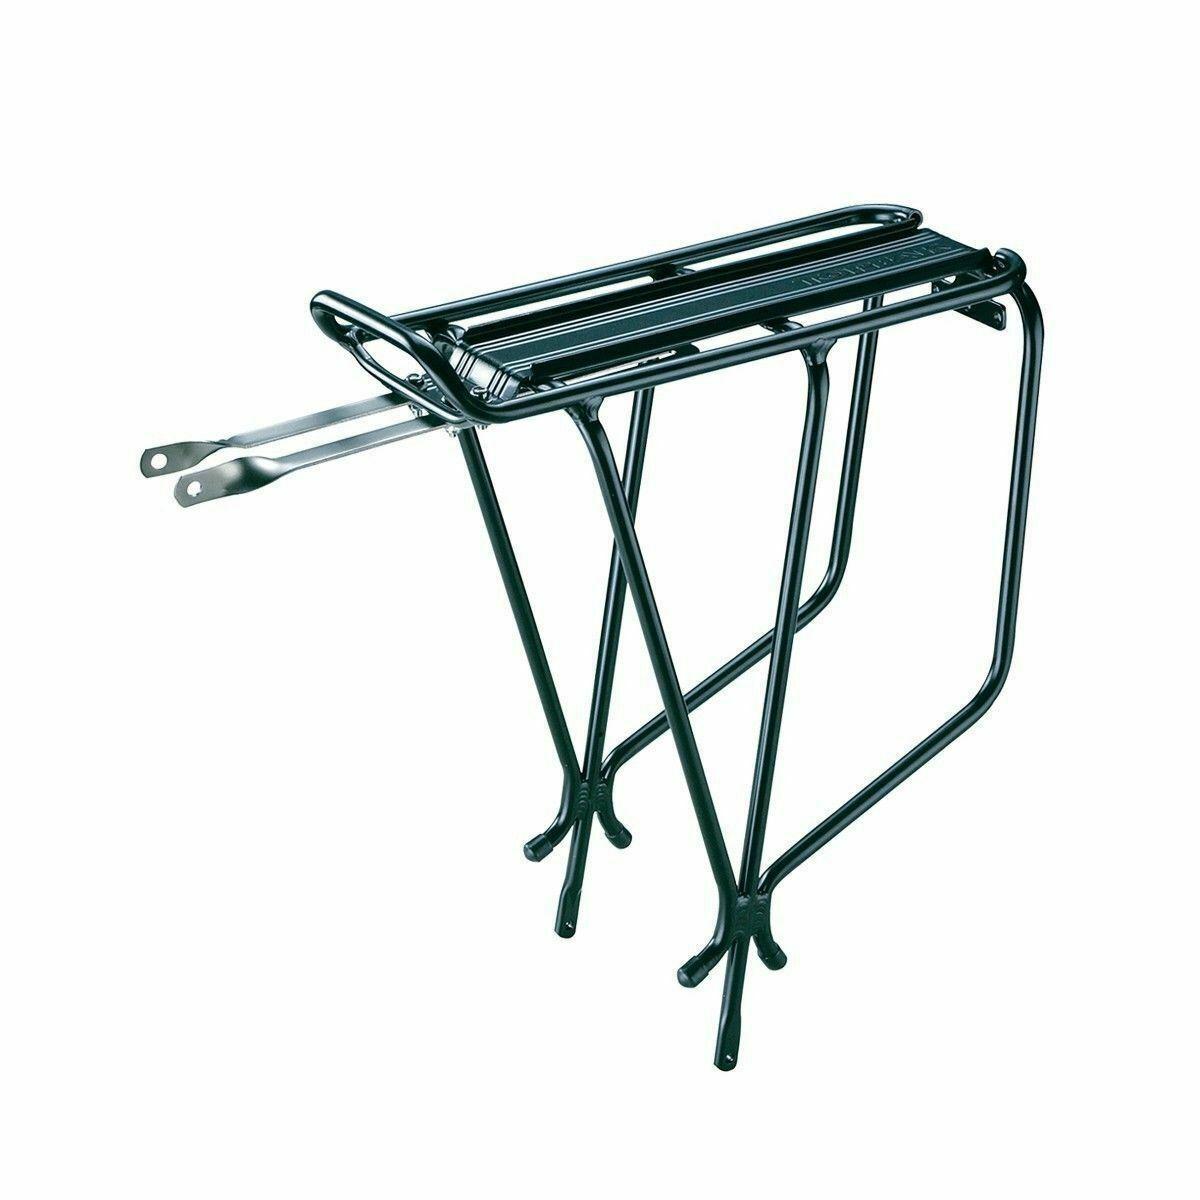 Buy Bicycle Bike Alloy Topeak Super Tourist Rack Seatpost